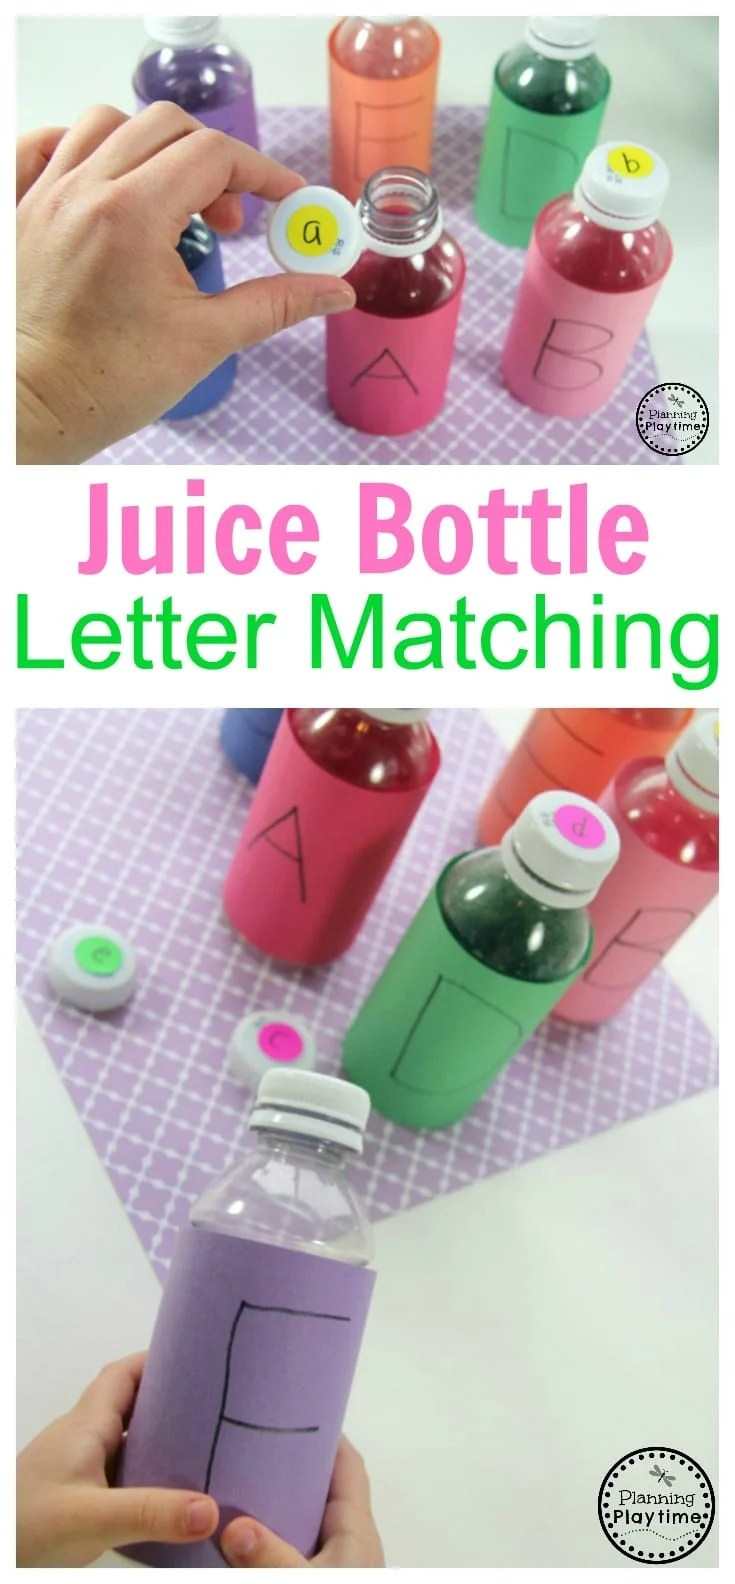 Preschool Letter Matching Activity using Juice Bottles